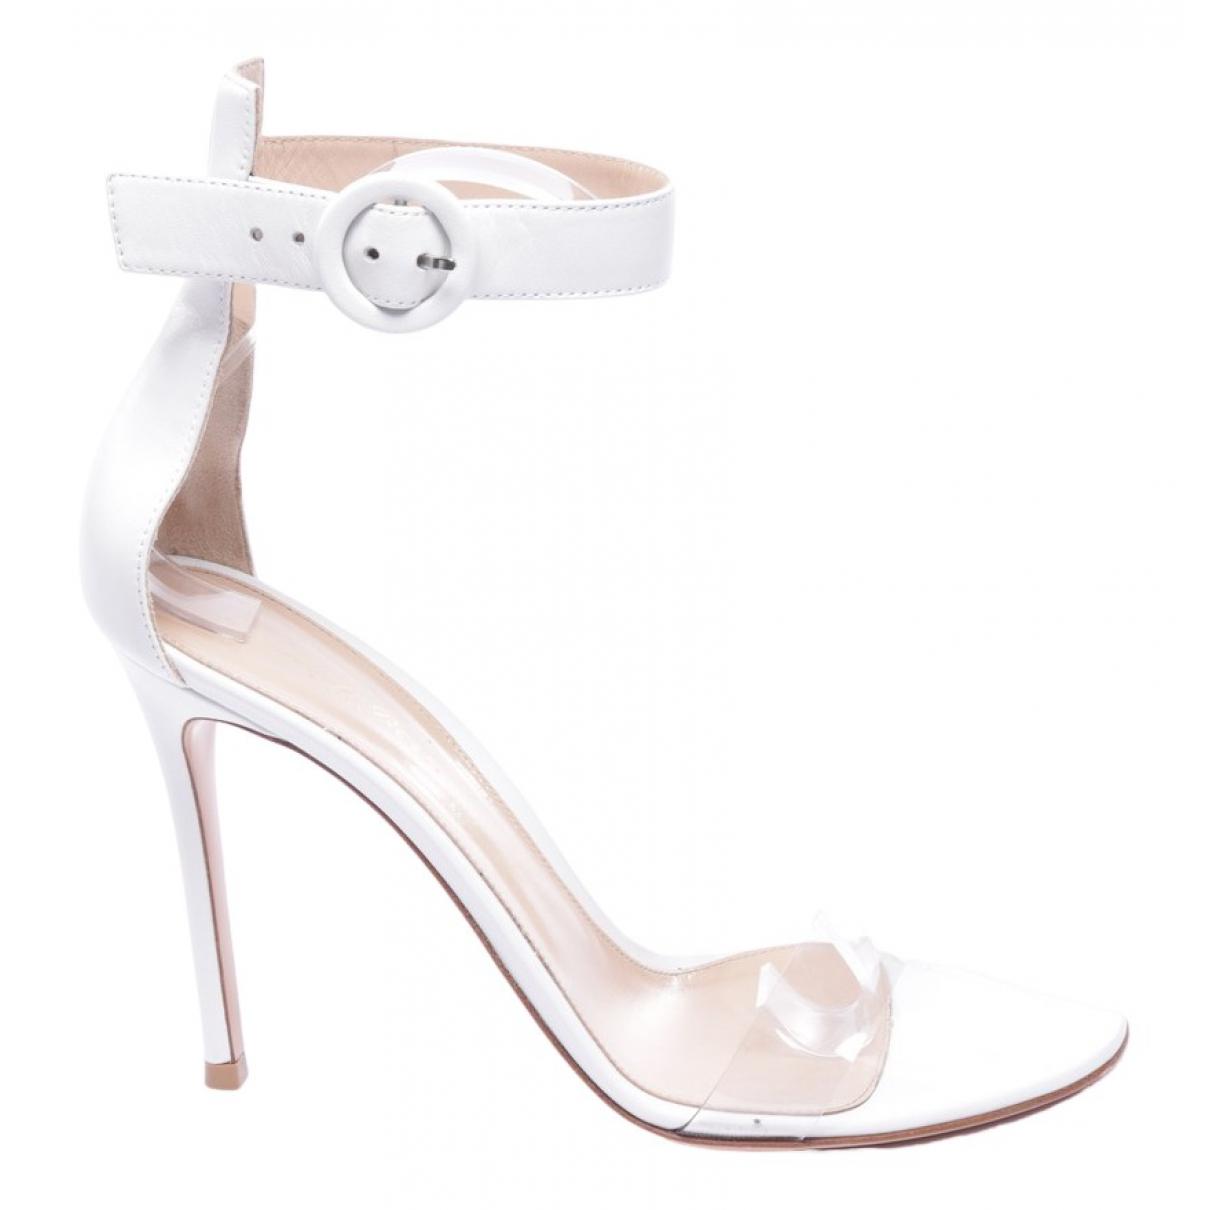 Sandalias de Cuero Gianvito Rossi